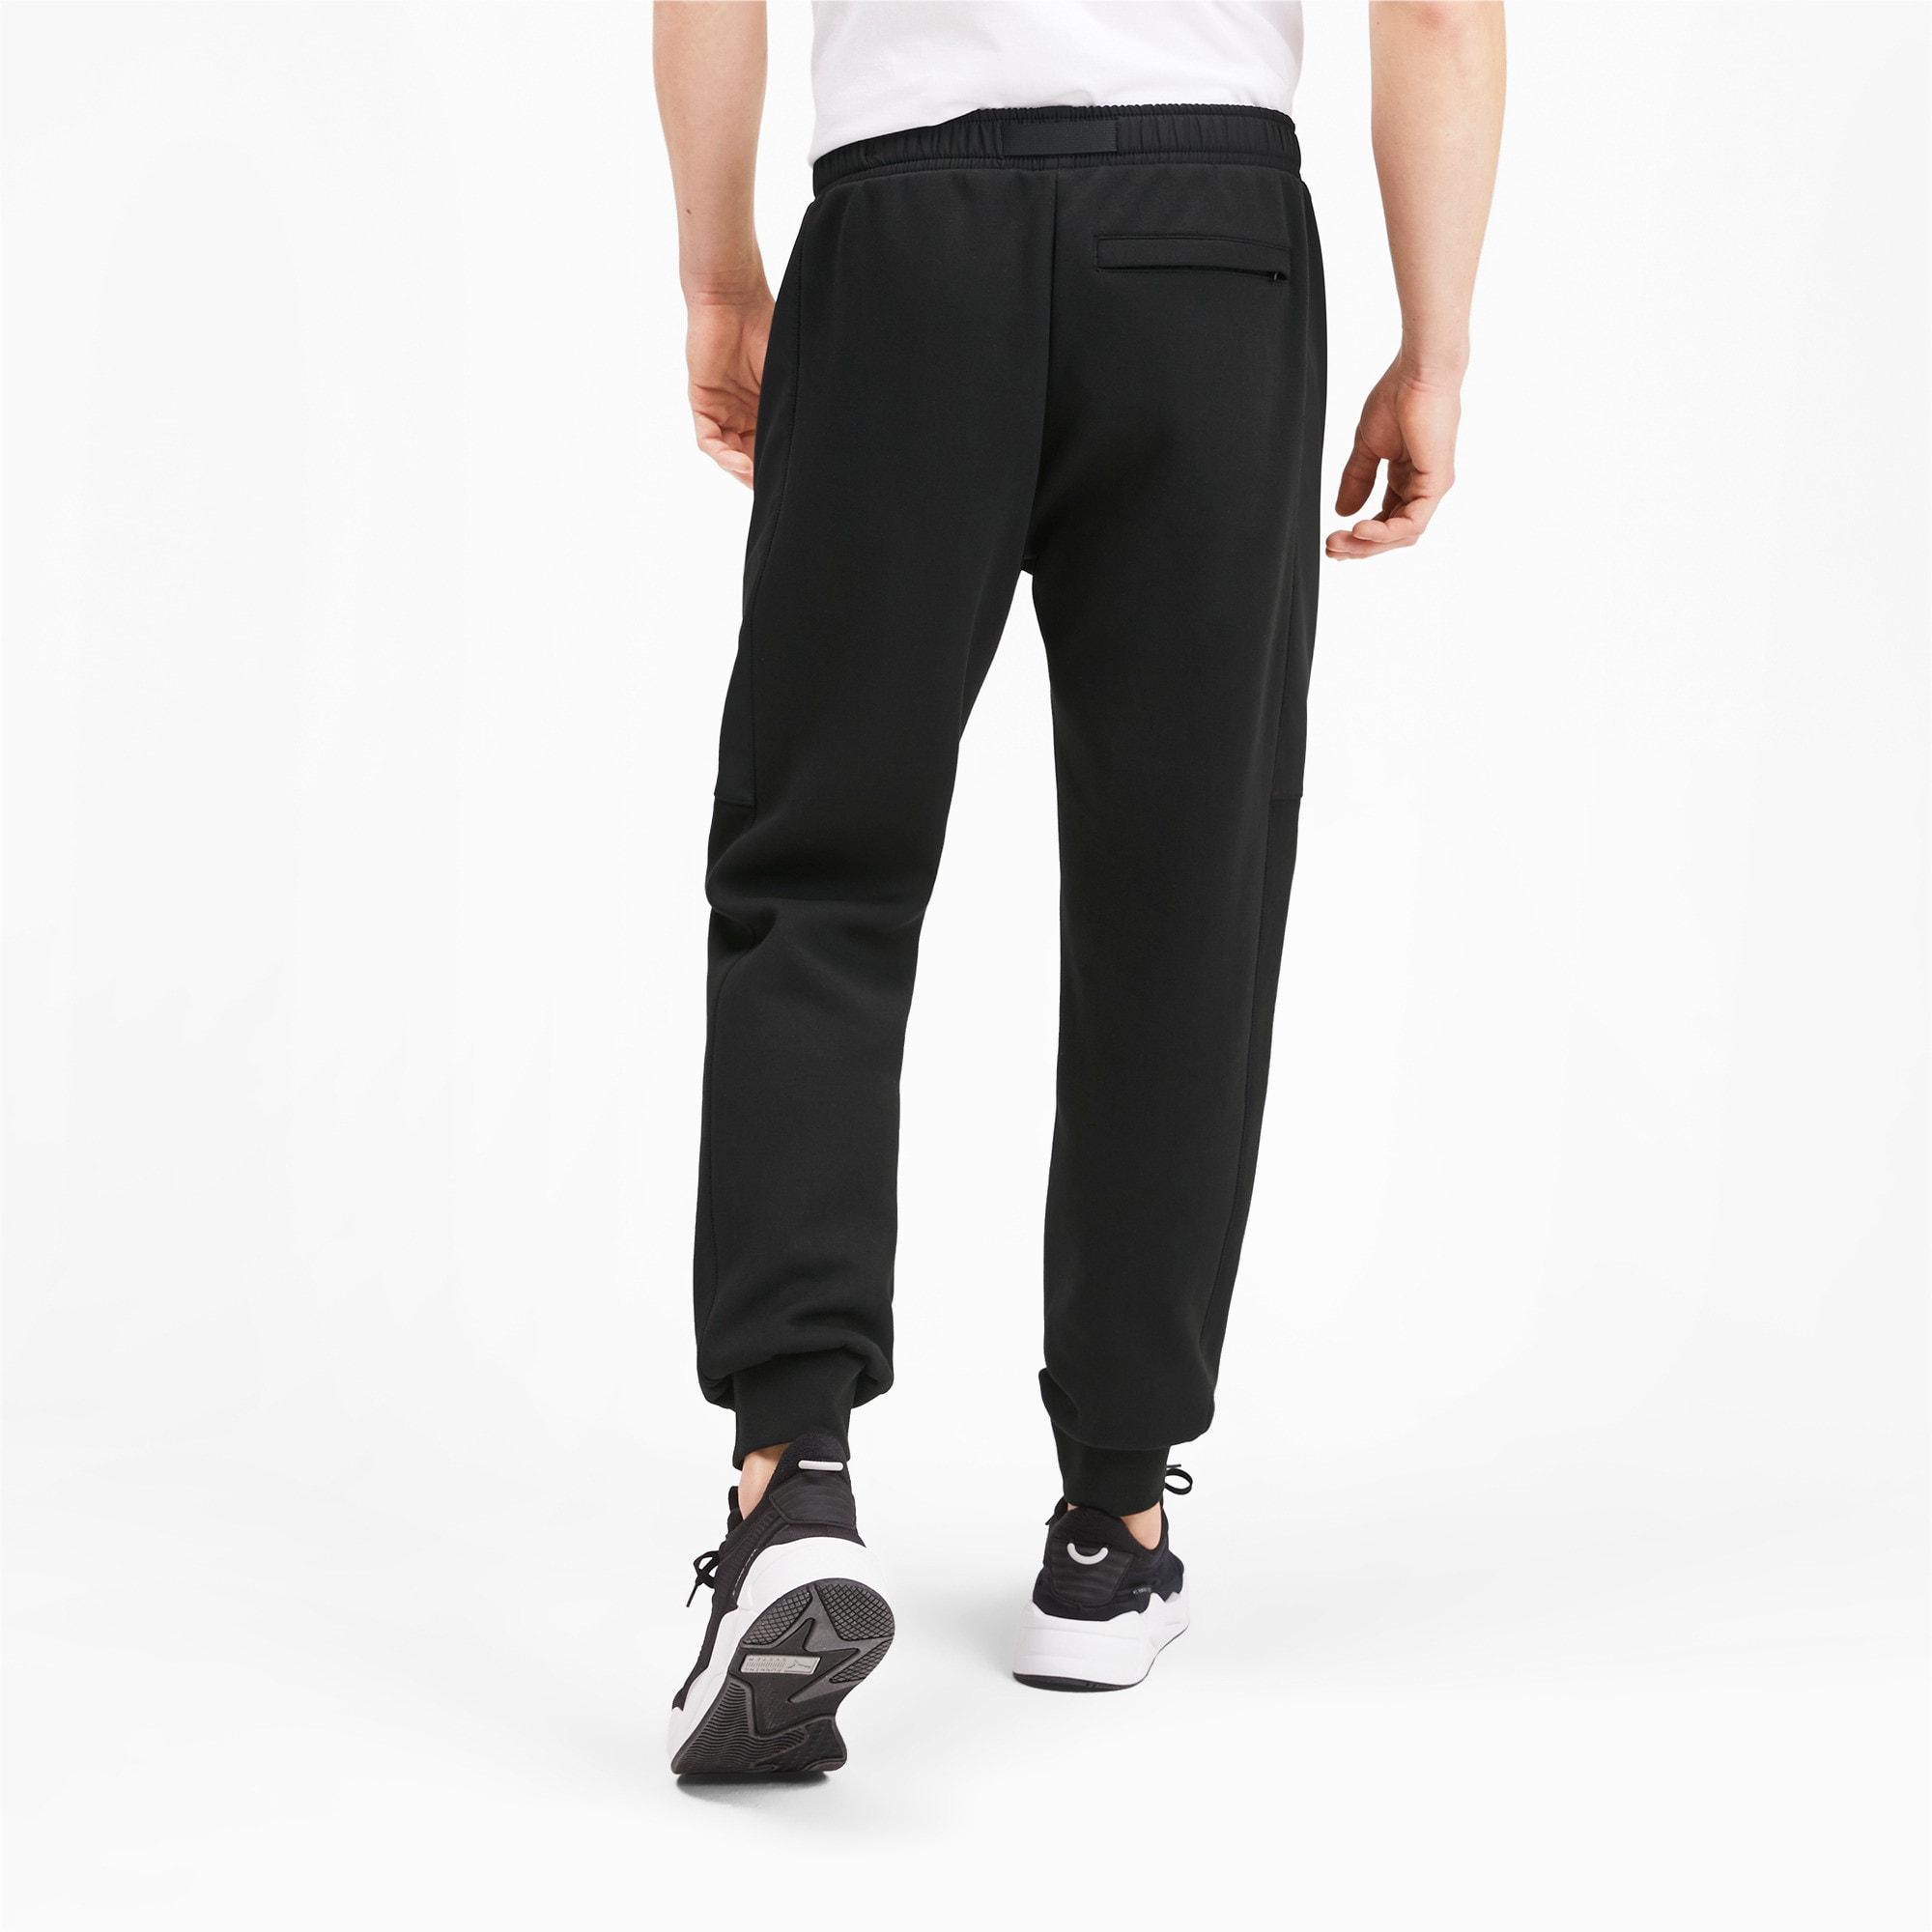 Miniatura 3 de Pantalones deportivos Epoch Hybrid para hombre, Puma Black, mediano